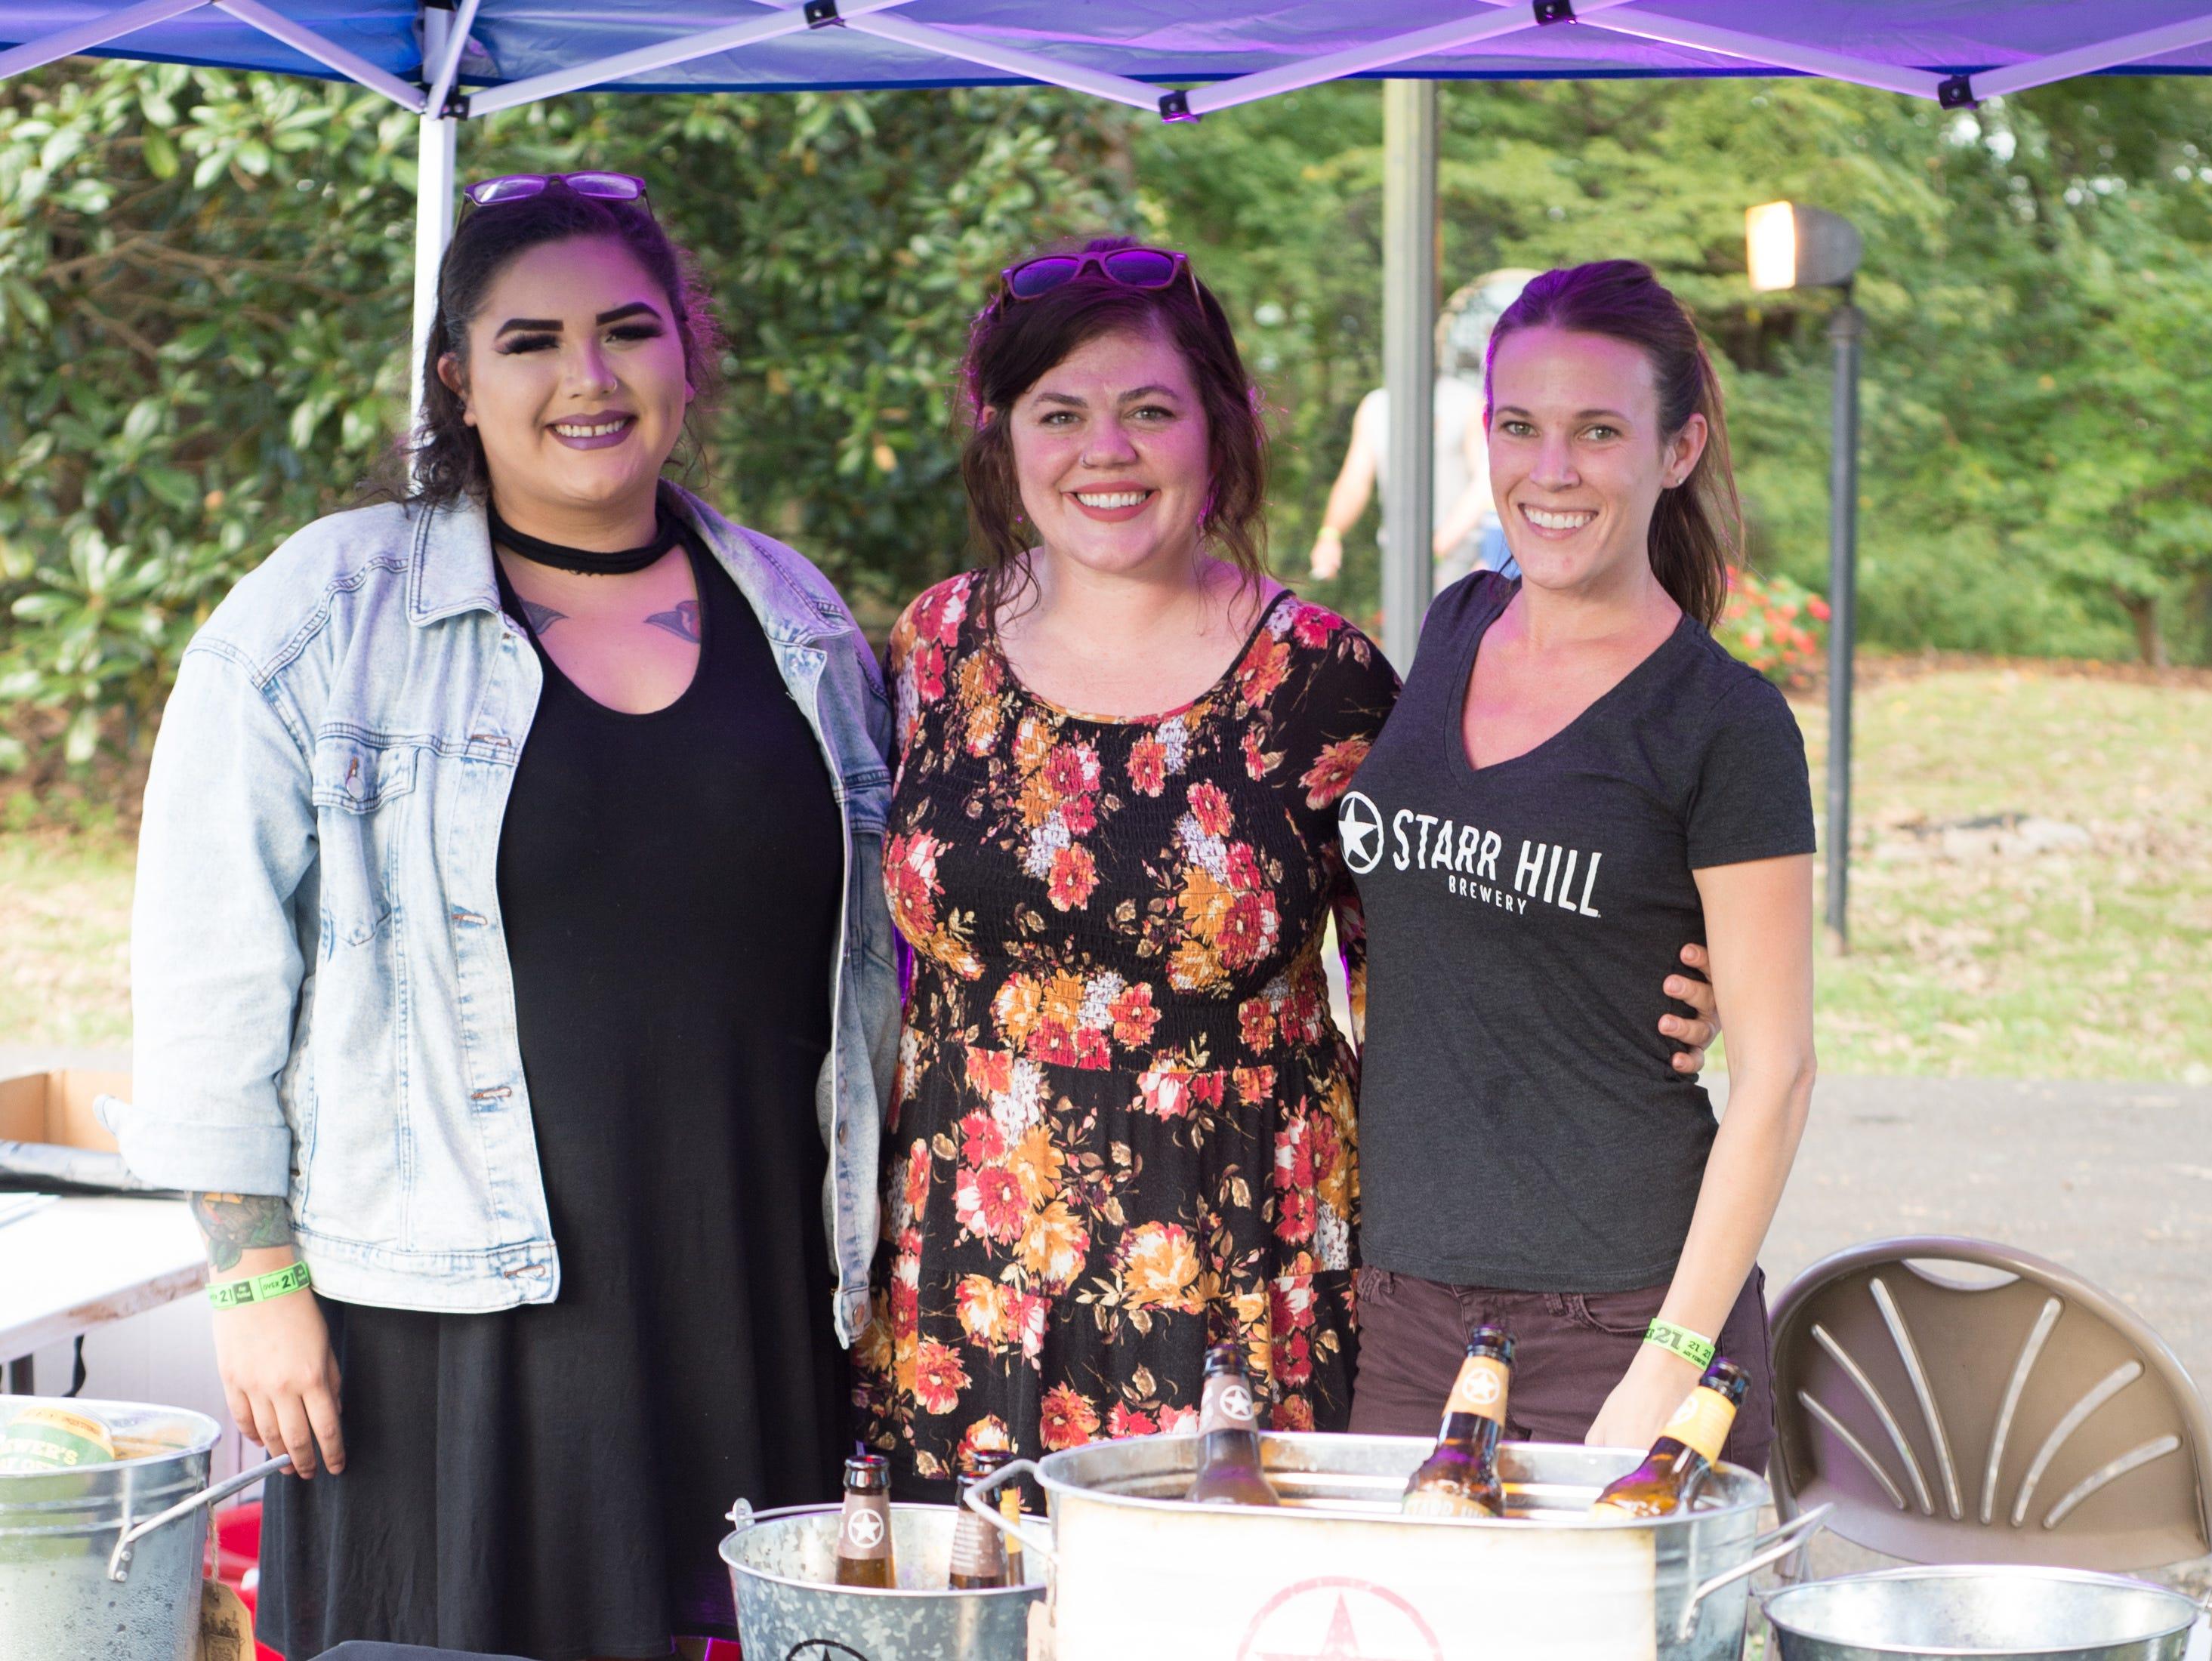 True Miller, Melissa Gay and Kristen Meier participate in Oktoberfest at Oaklands Mansion in Murfreesboro on Saturday, Sept. 29.